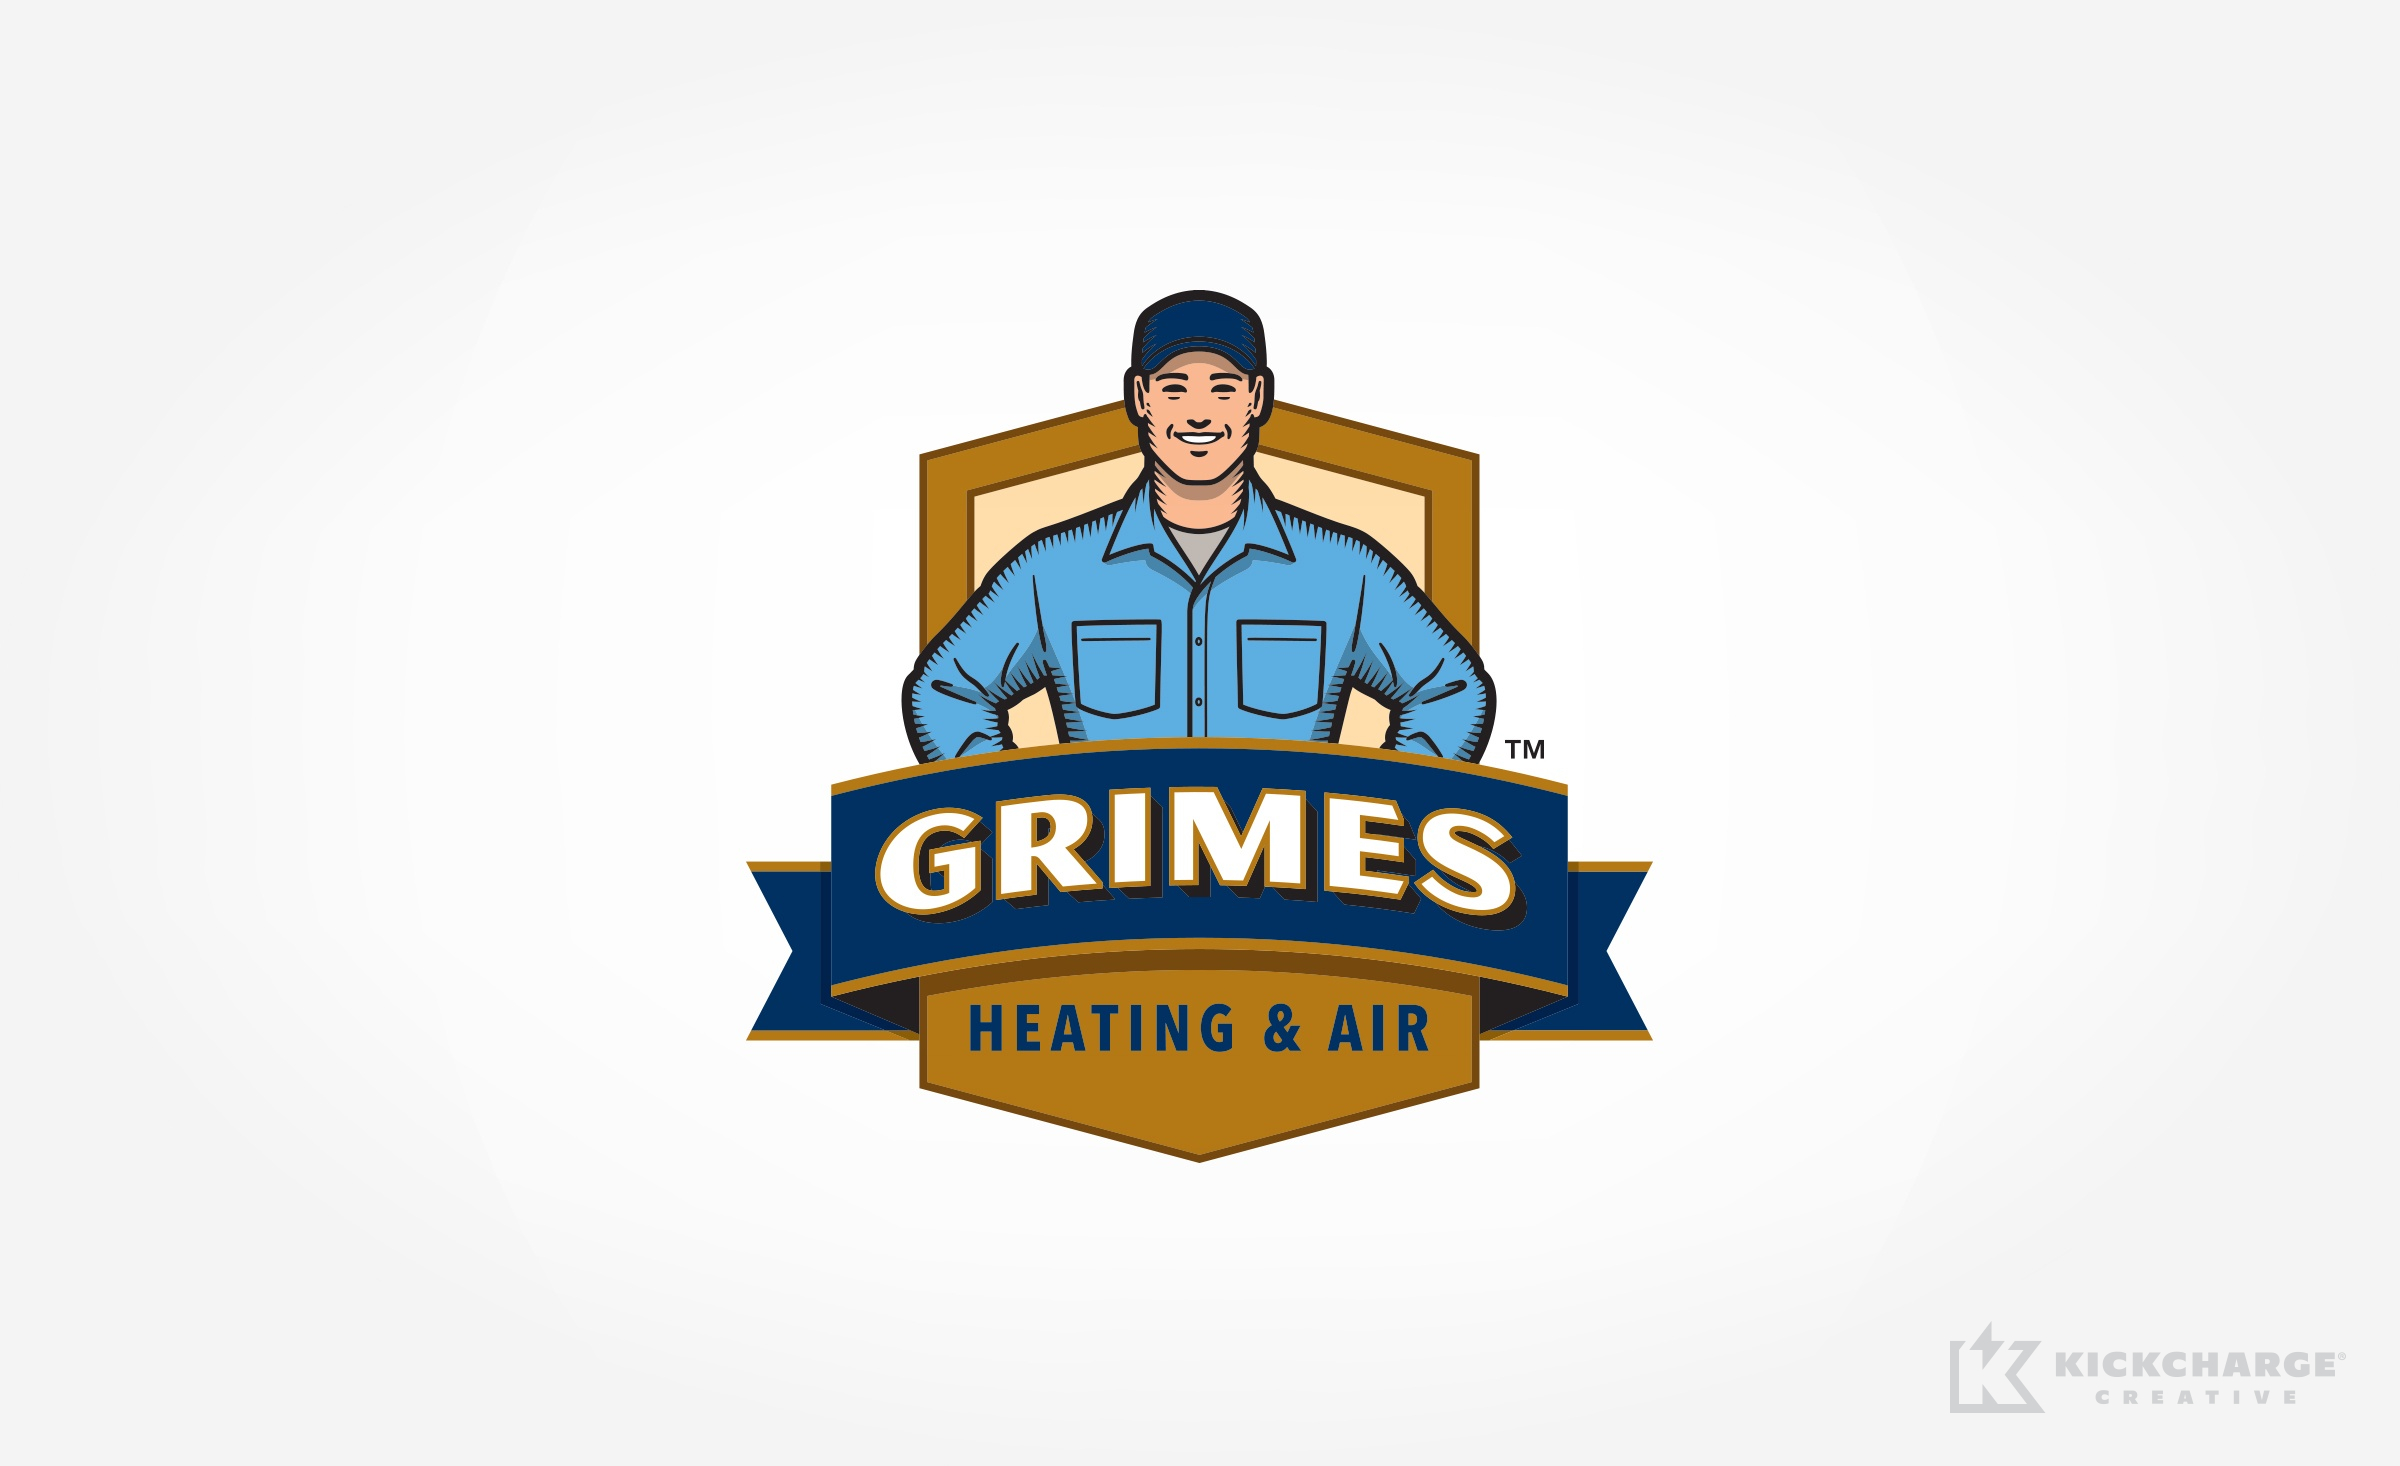 hvac logo for Grimes Heating & Air